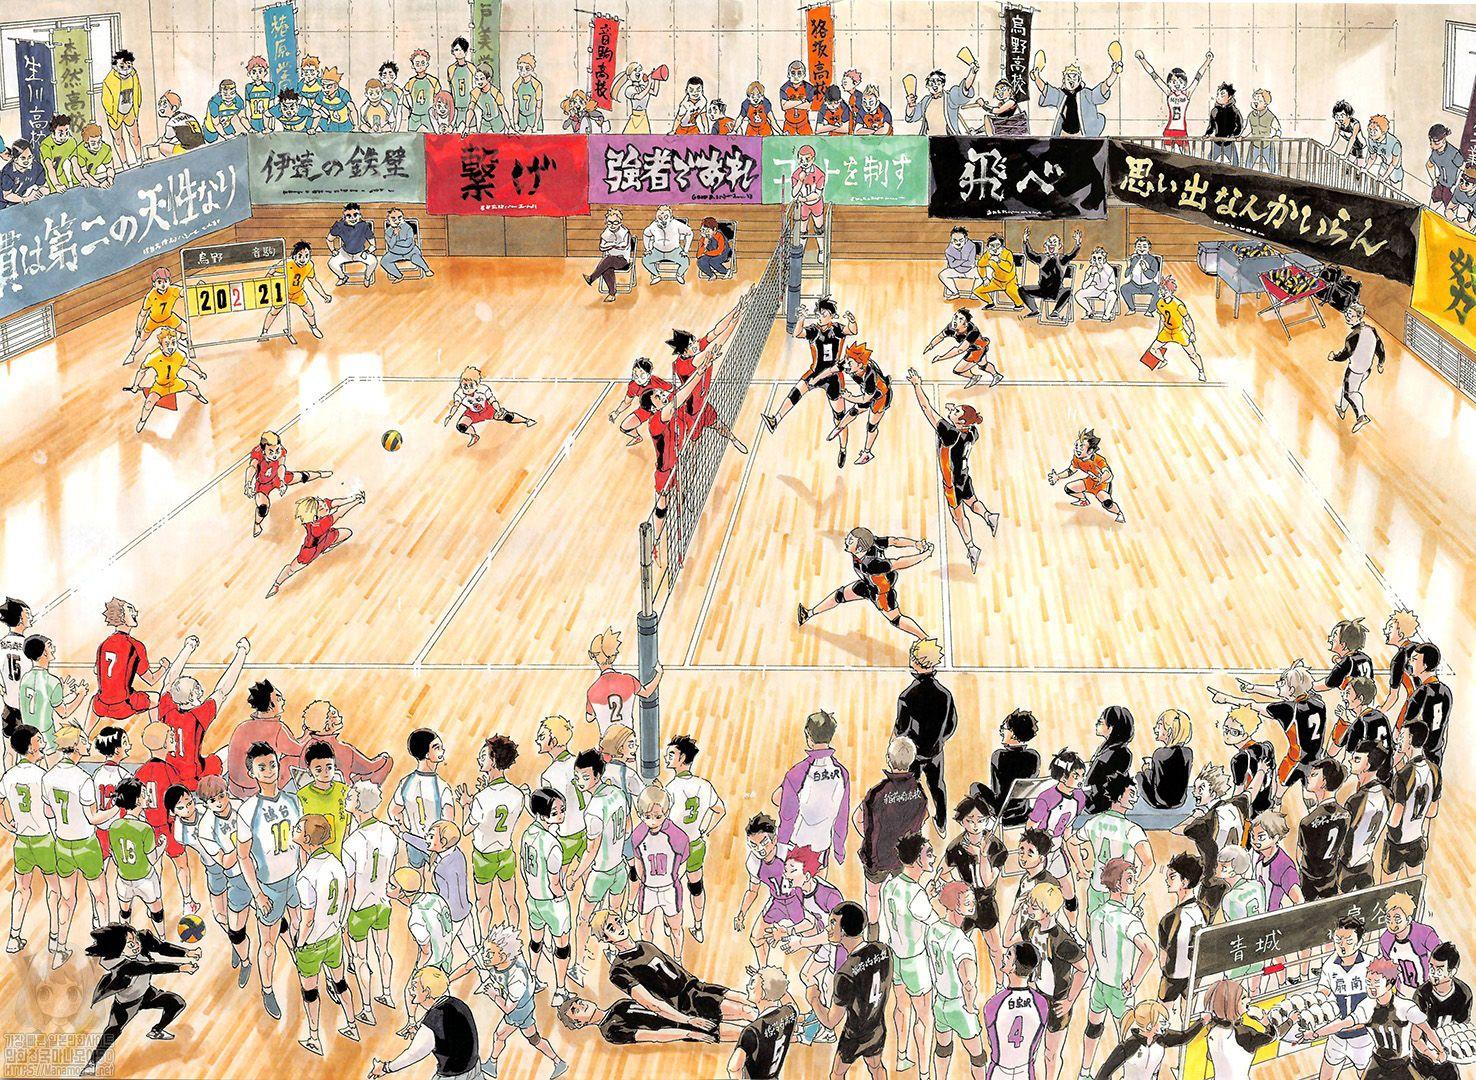 Haikyuu Chapter 402 Karasuno Volleyball Club Gather Haikyuu Manga Online In 2020 Haikyuu Manga Haikyuu Haikyuu Fanart